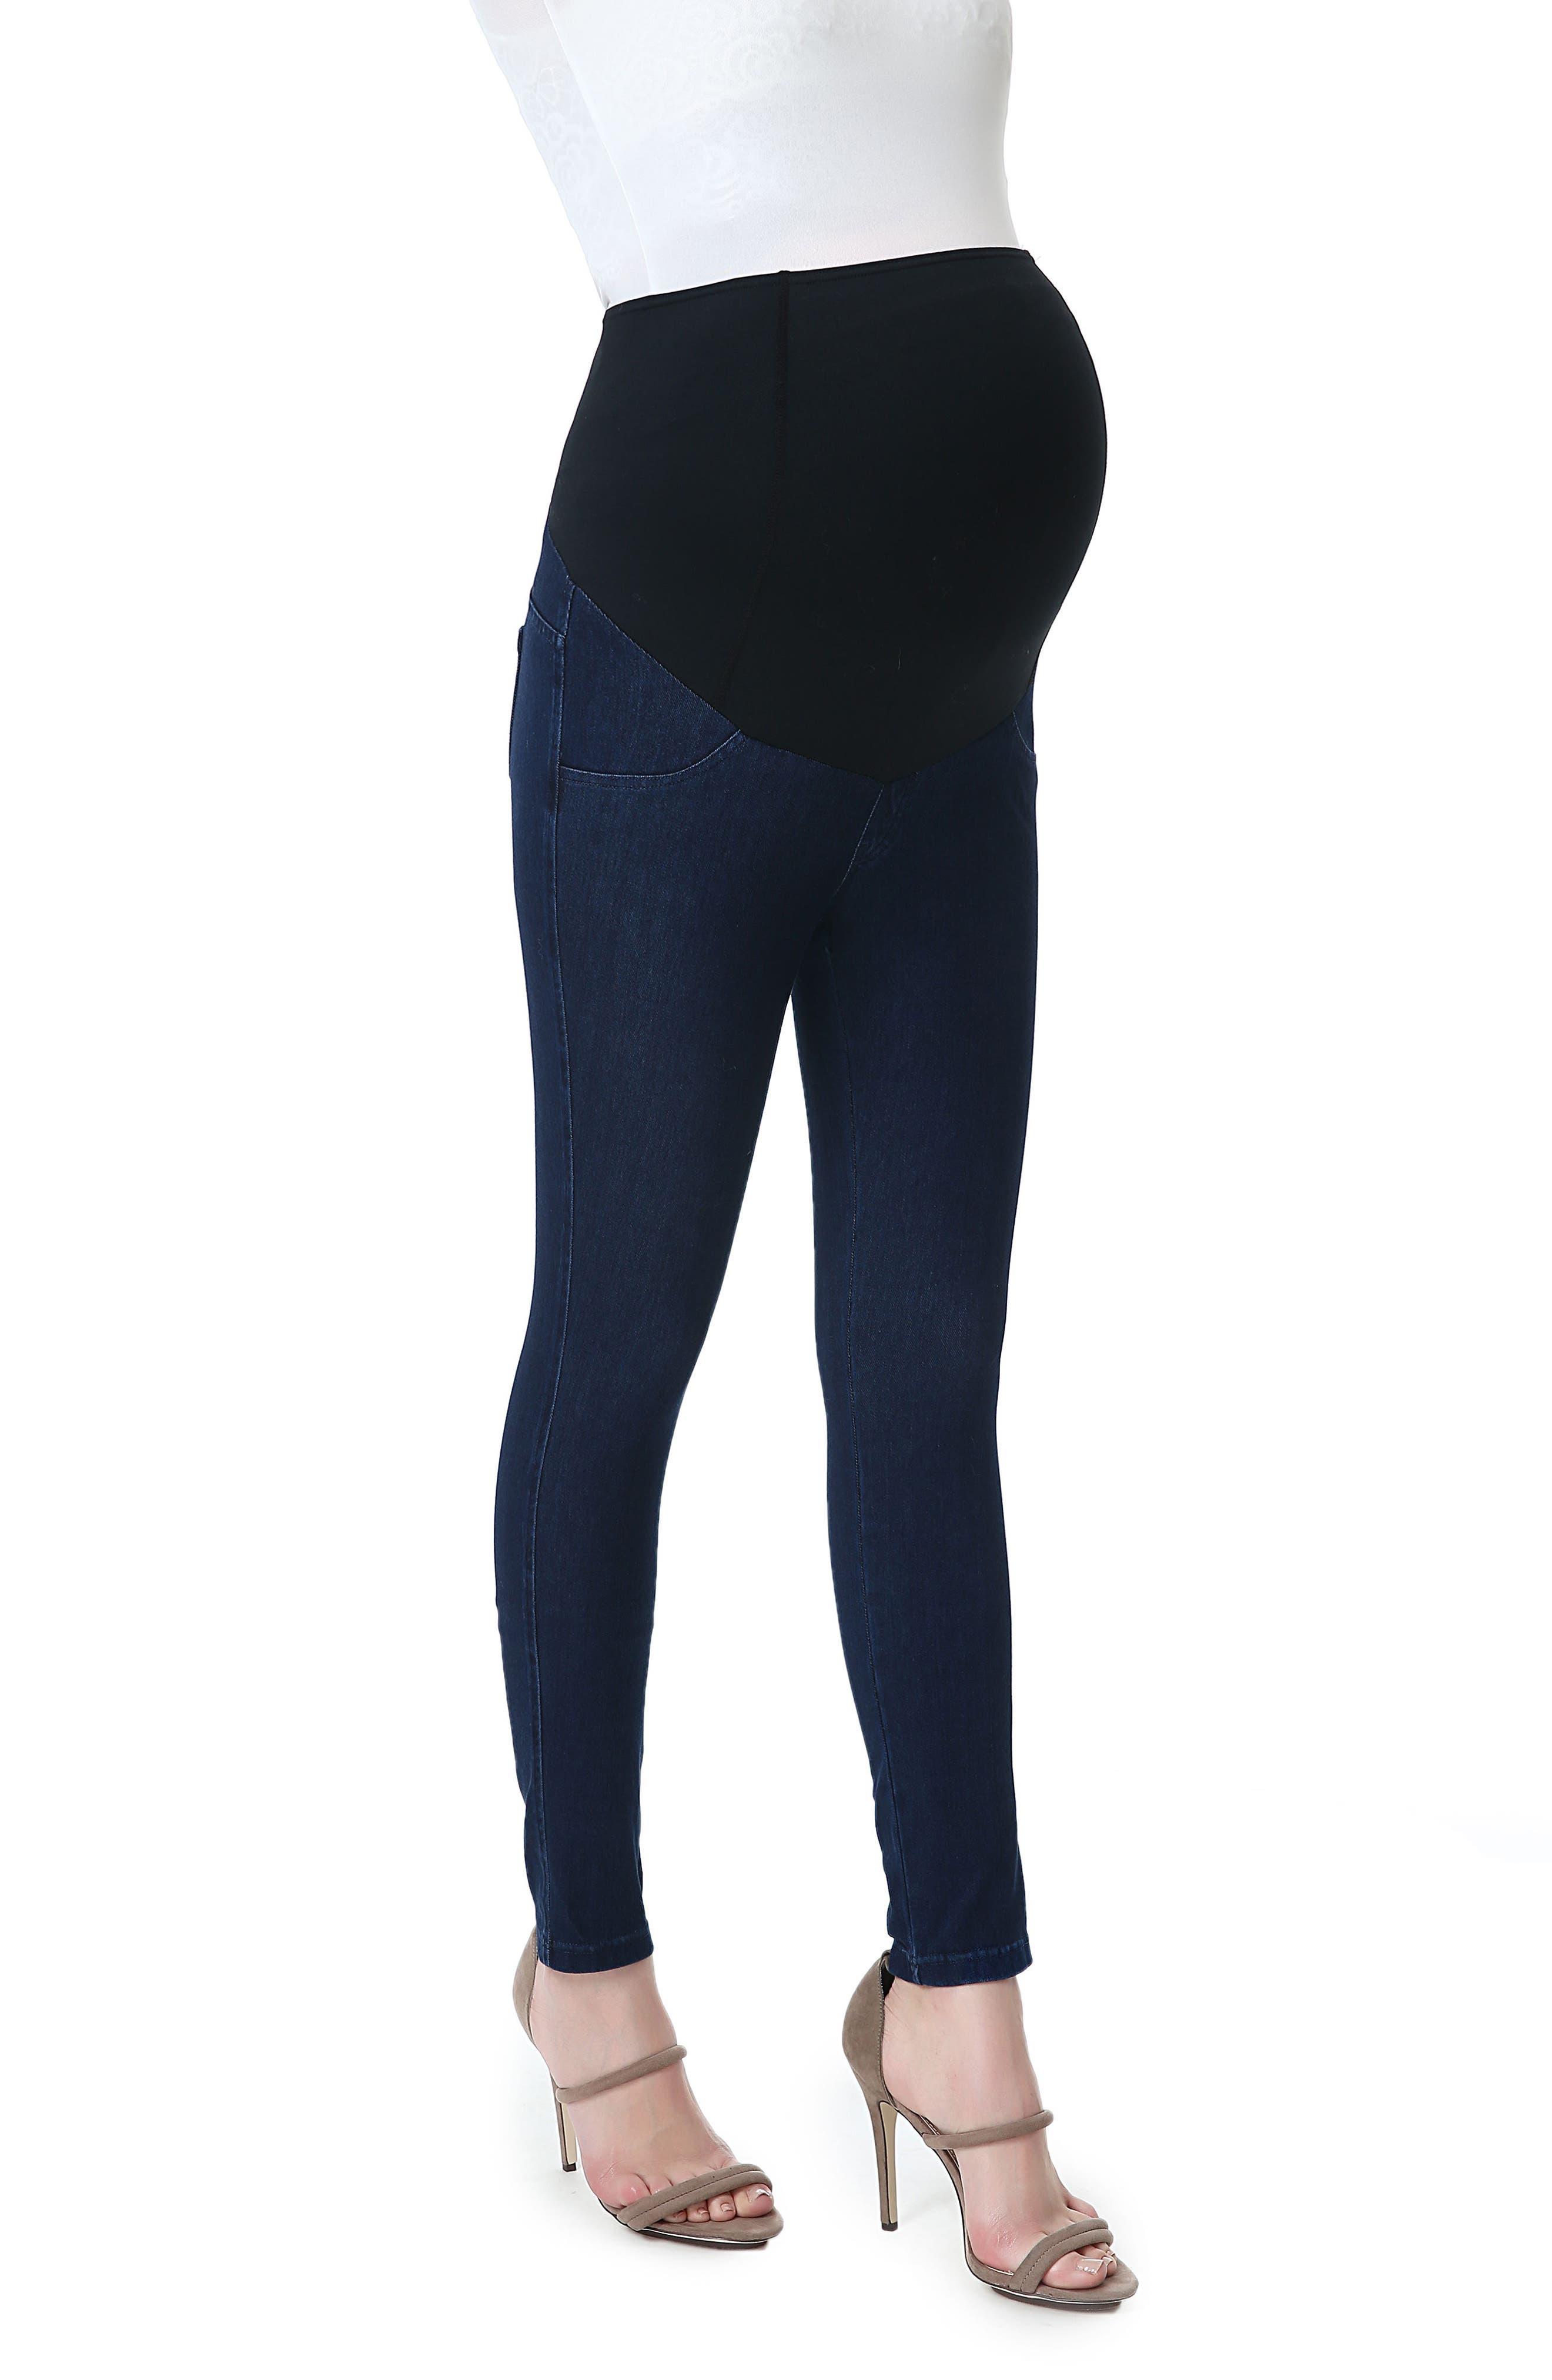 Kimi & Kai Lenora Maternity Leggings,                         Main,                         color, Denim Blue